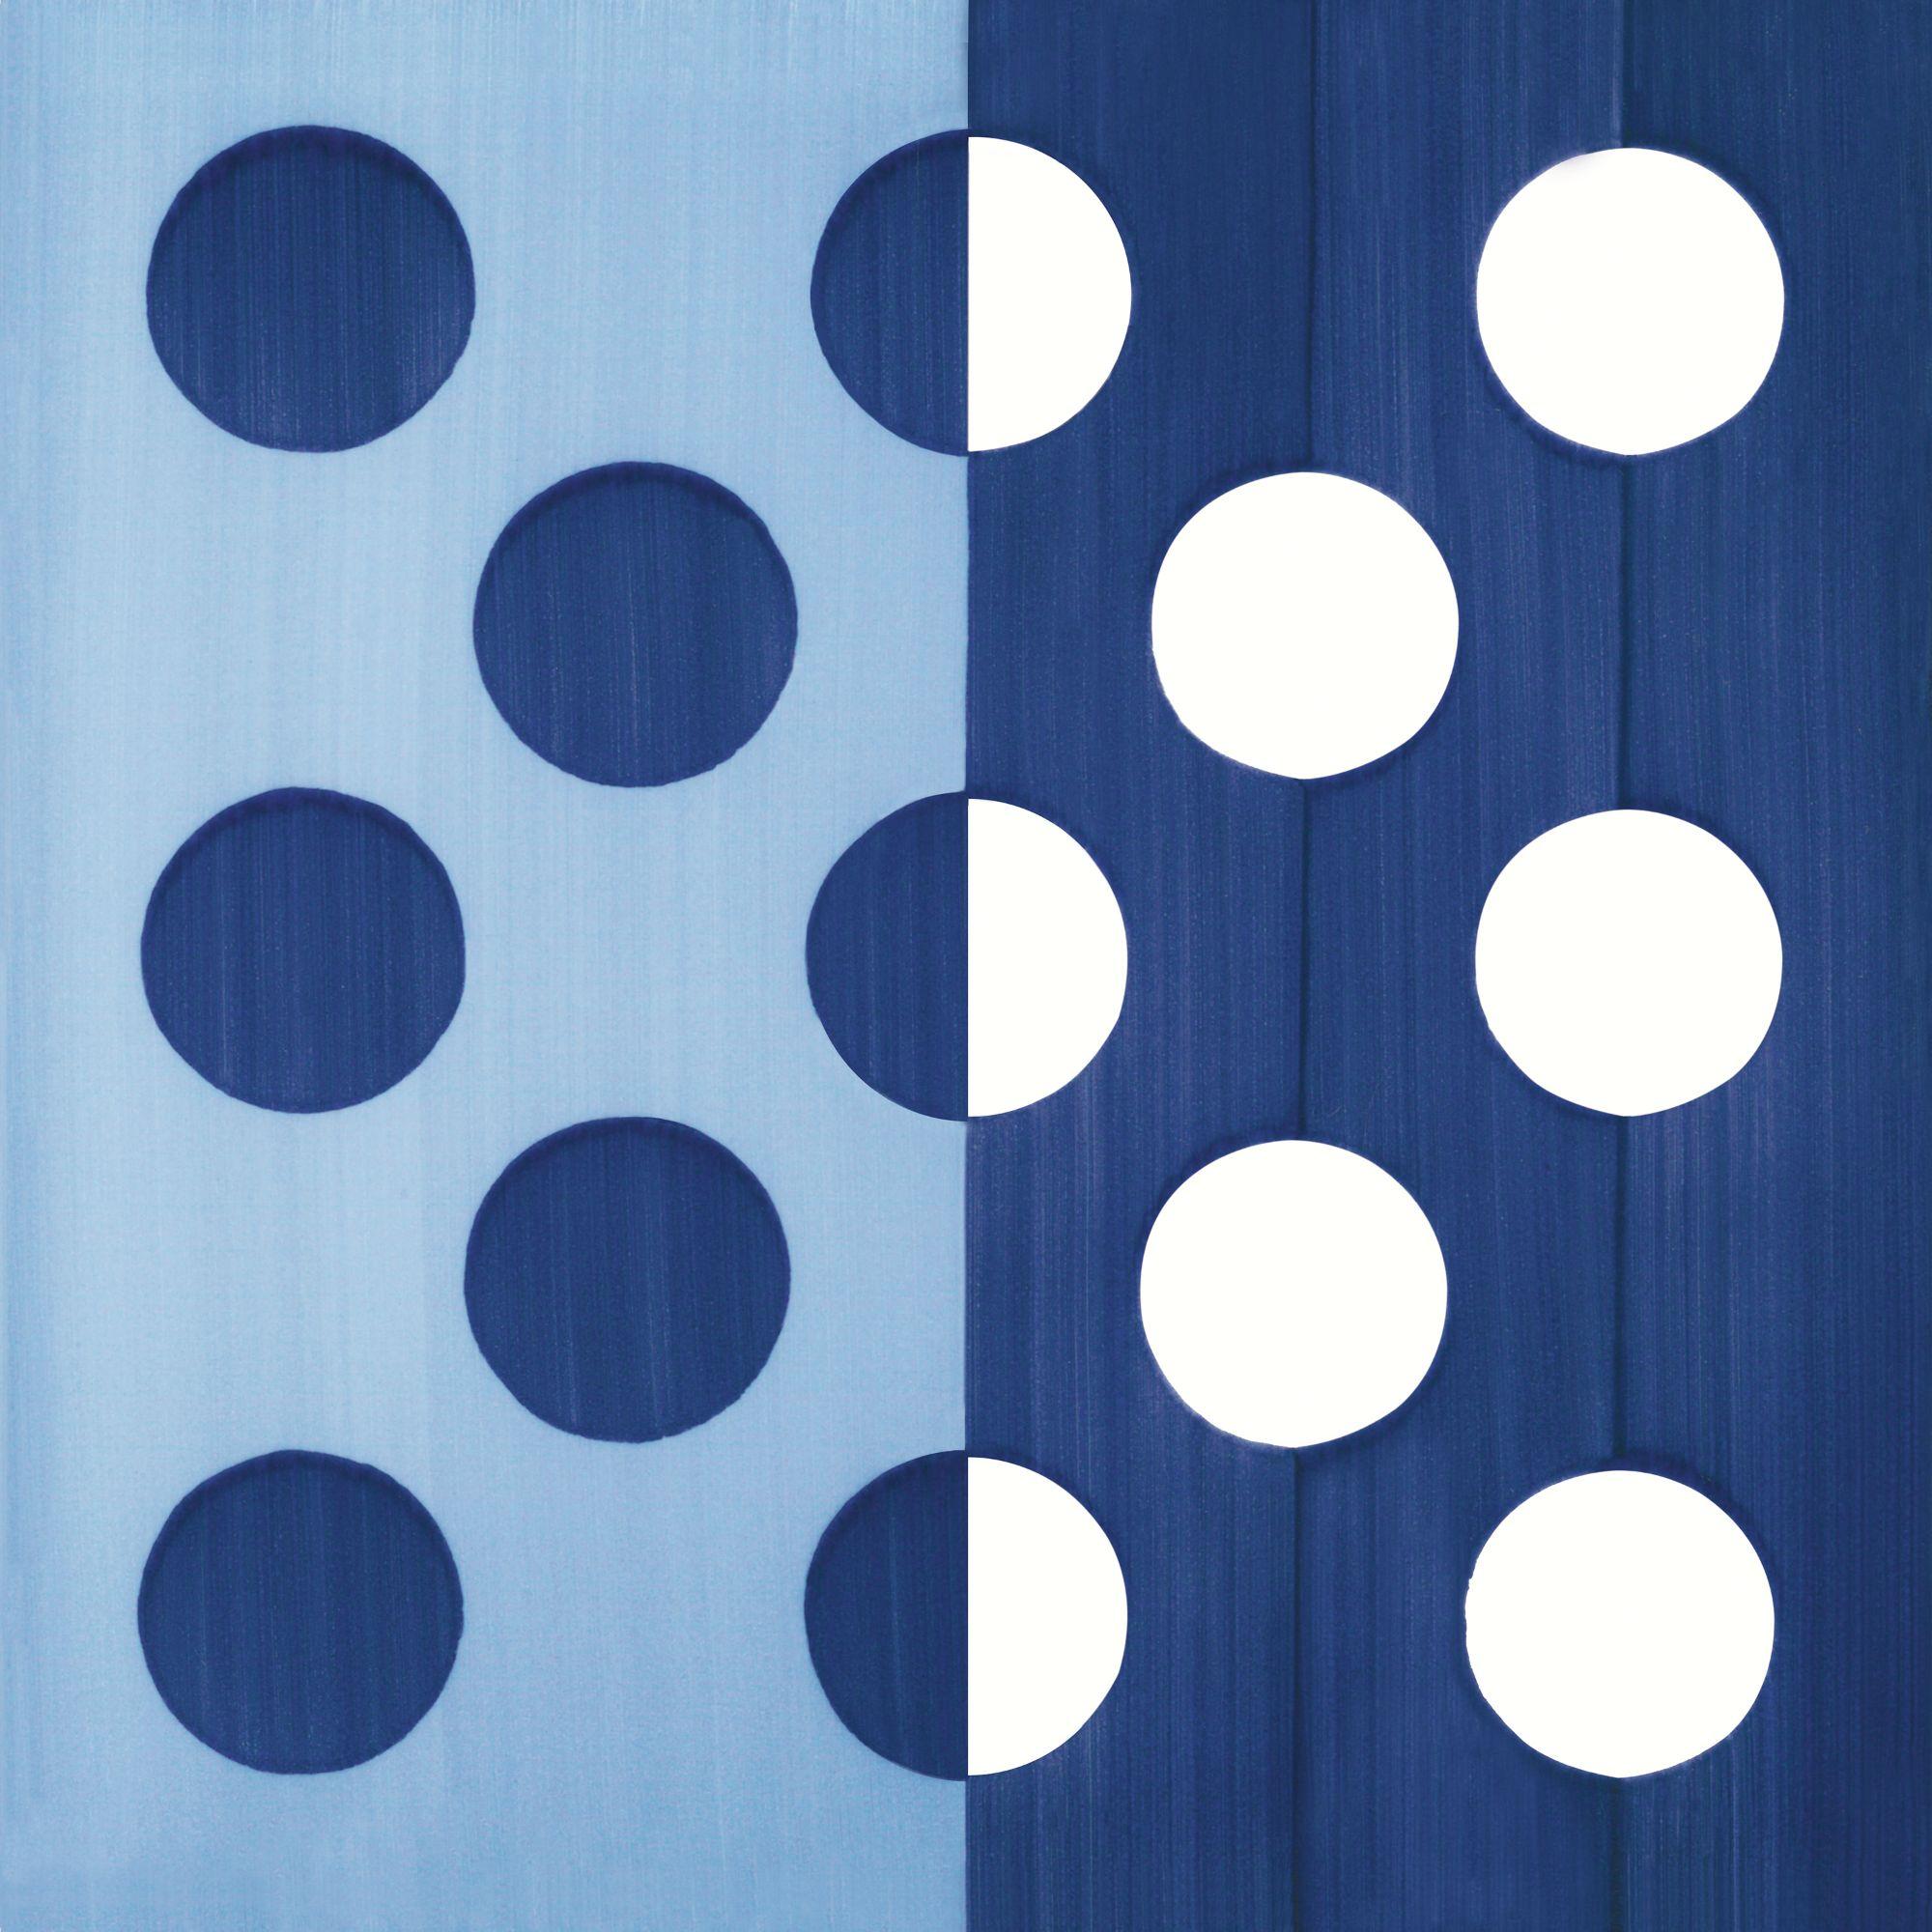 blu-ponti-decoro-tipo-22